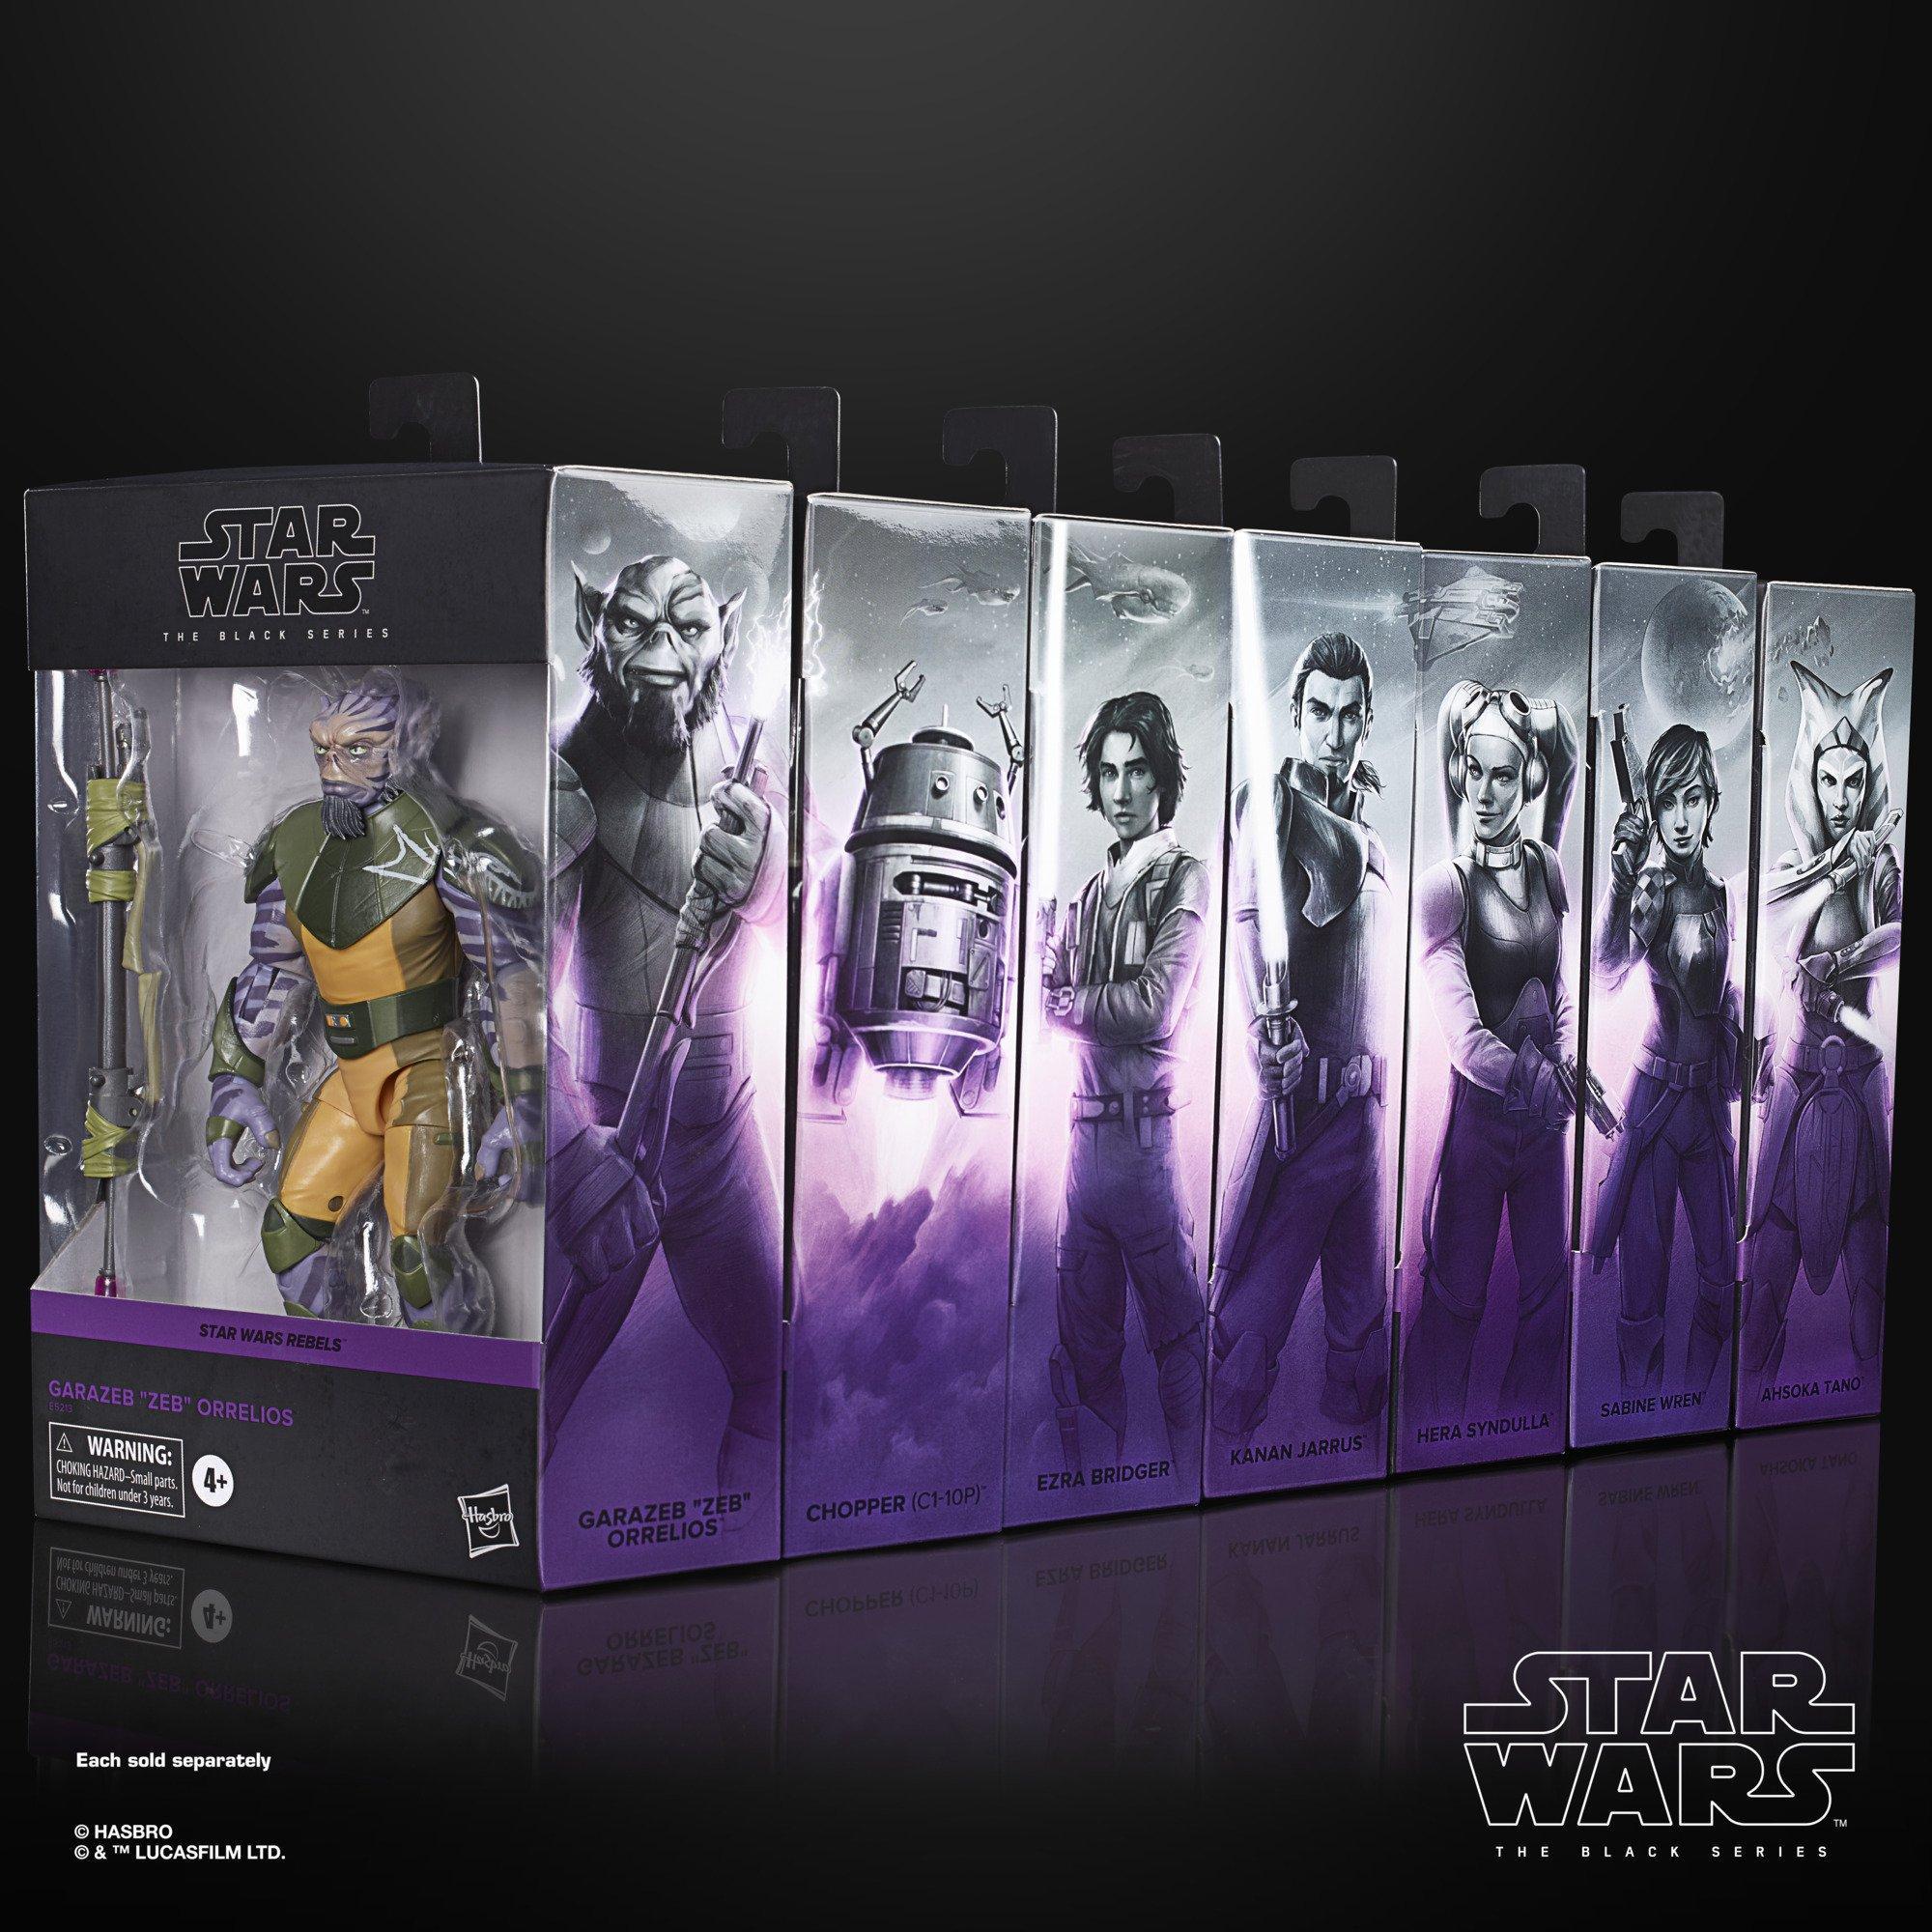 Star Wars Rebels The Black Series Deluxe Action Figure Bundle